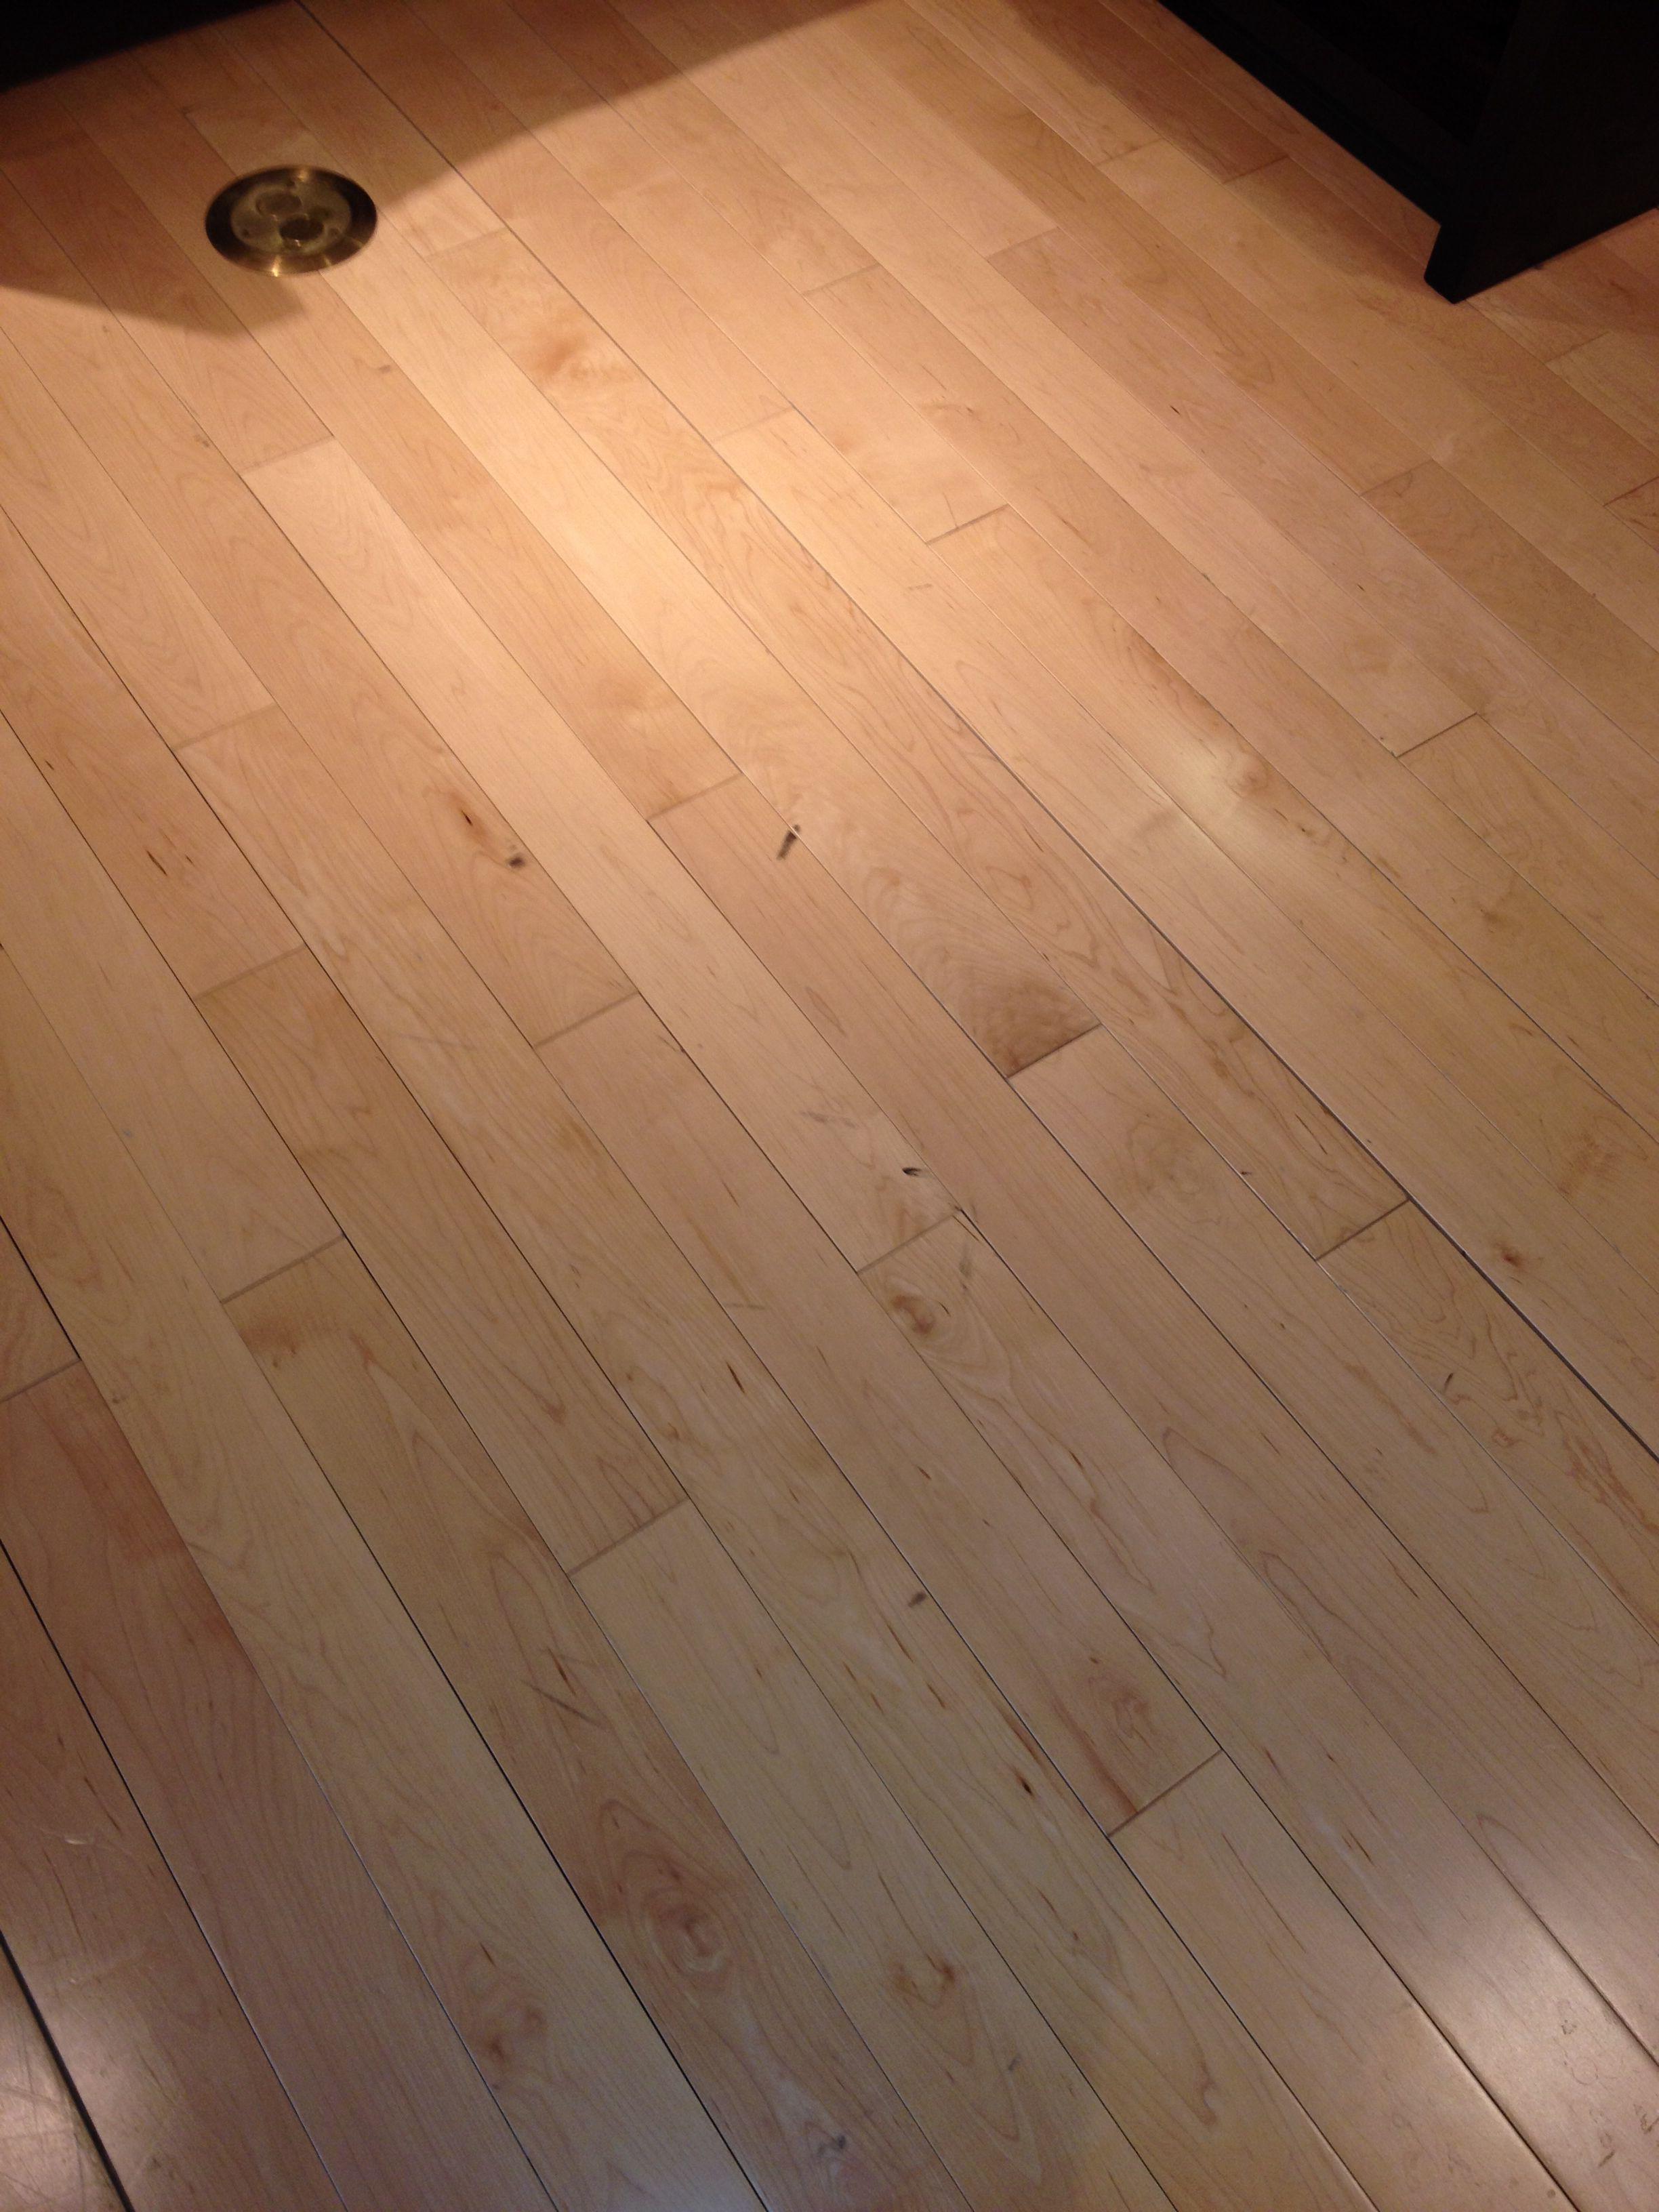 Somerset White Oak Engineered Hardwood Flooring Of Maple Wood Floors Retail Design Sketch Rendering Pinterest Pertaining to Maple Wood Floors